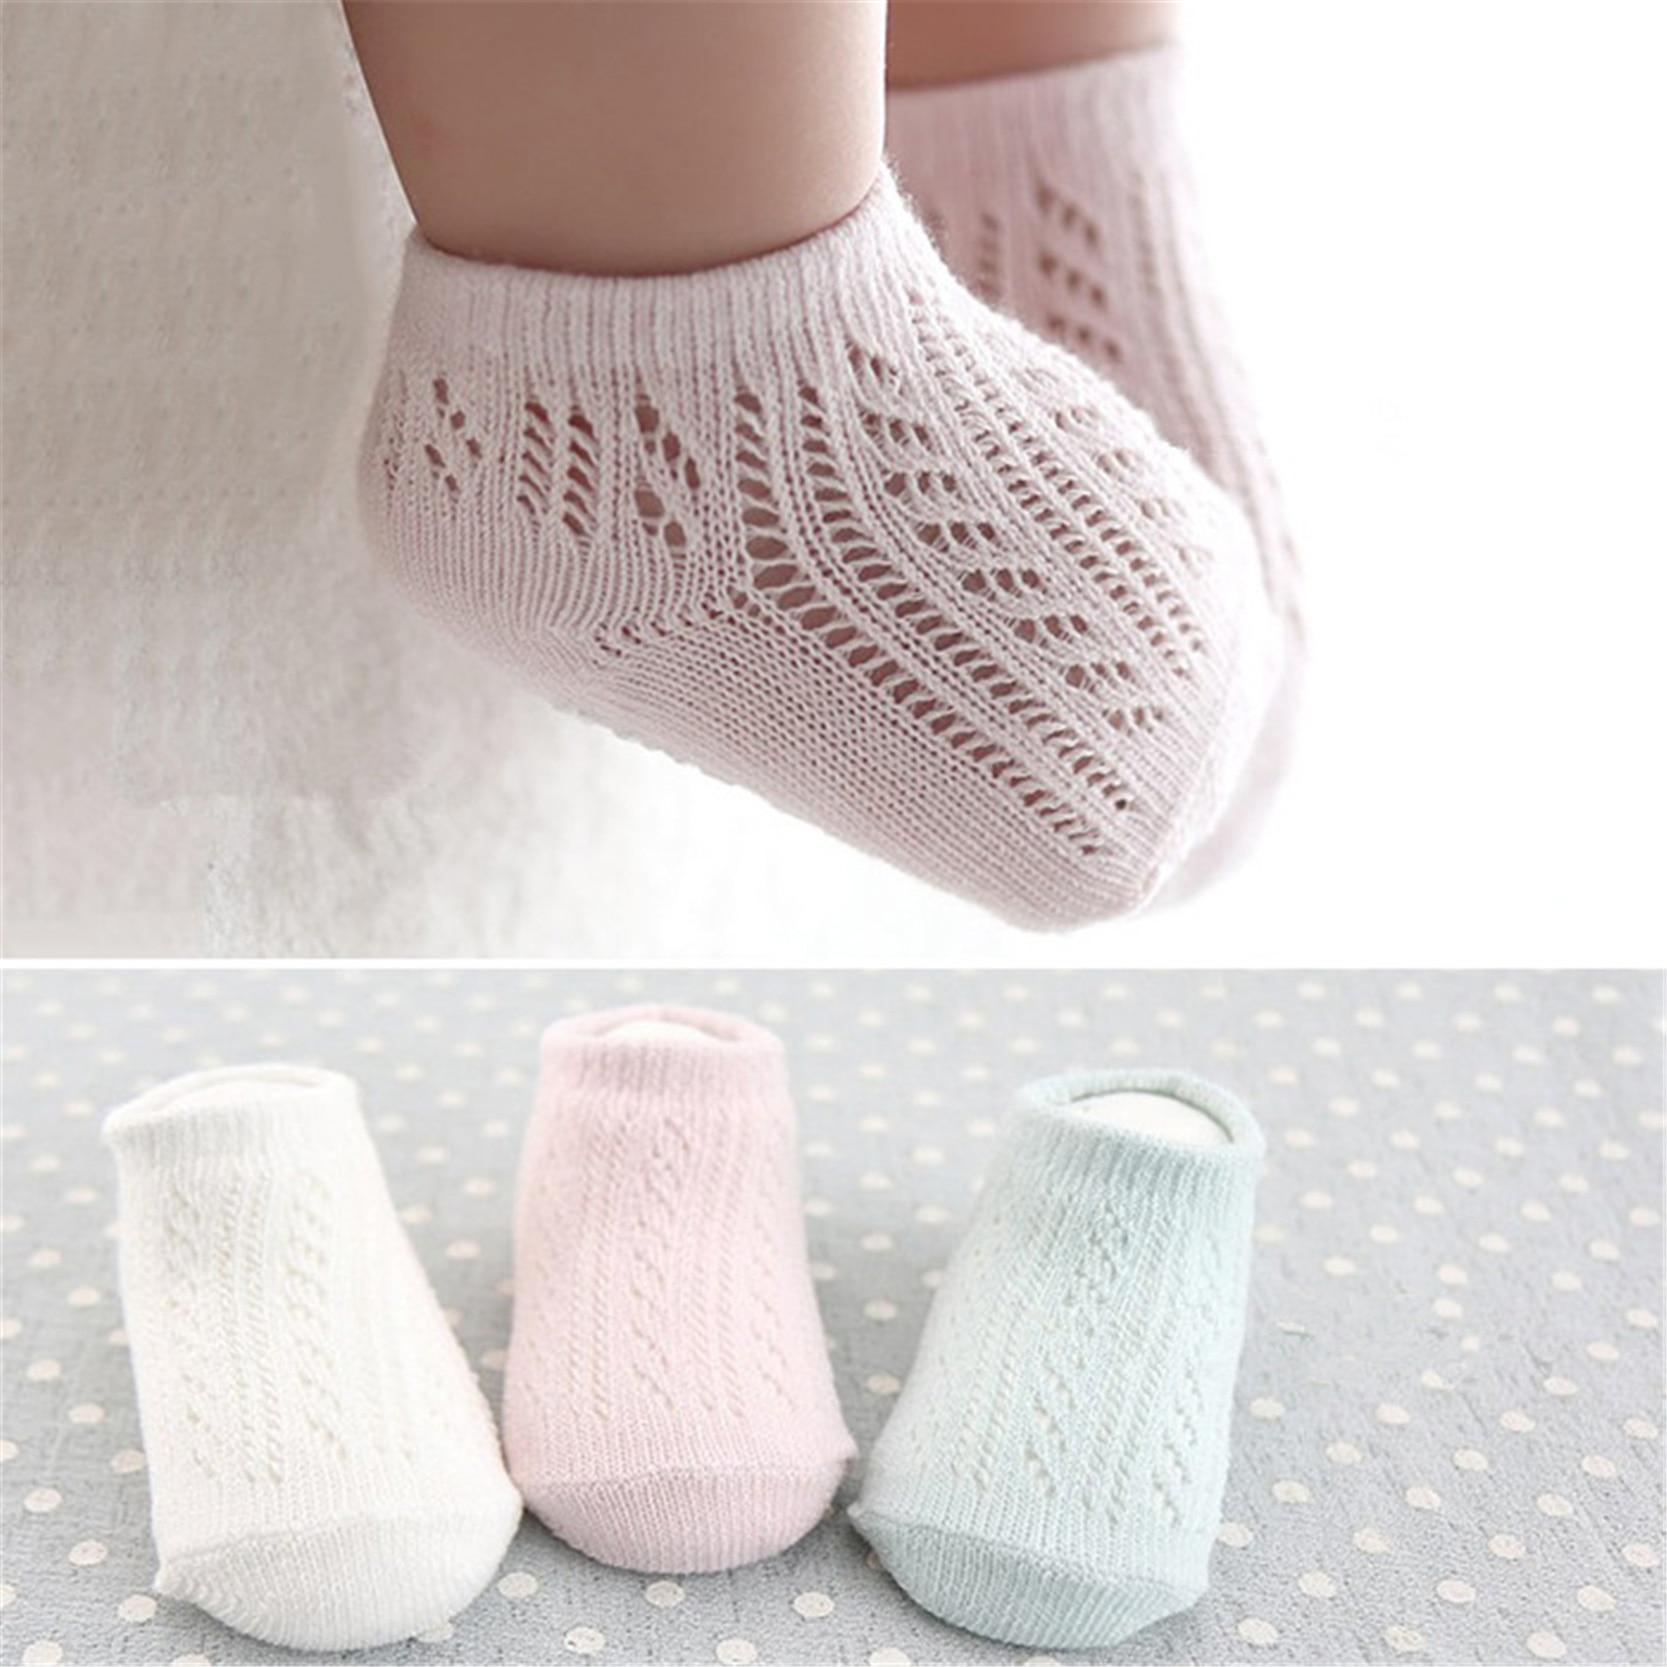 Frühling Sommer Mesh Baby Socken Für Neugeborene Unisex Kid Kinder Infant Junge Mädchen Kurze Socken